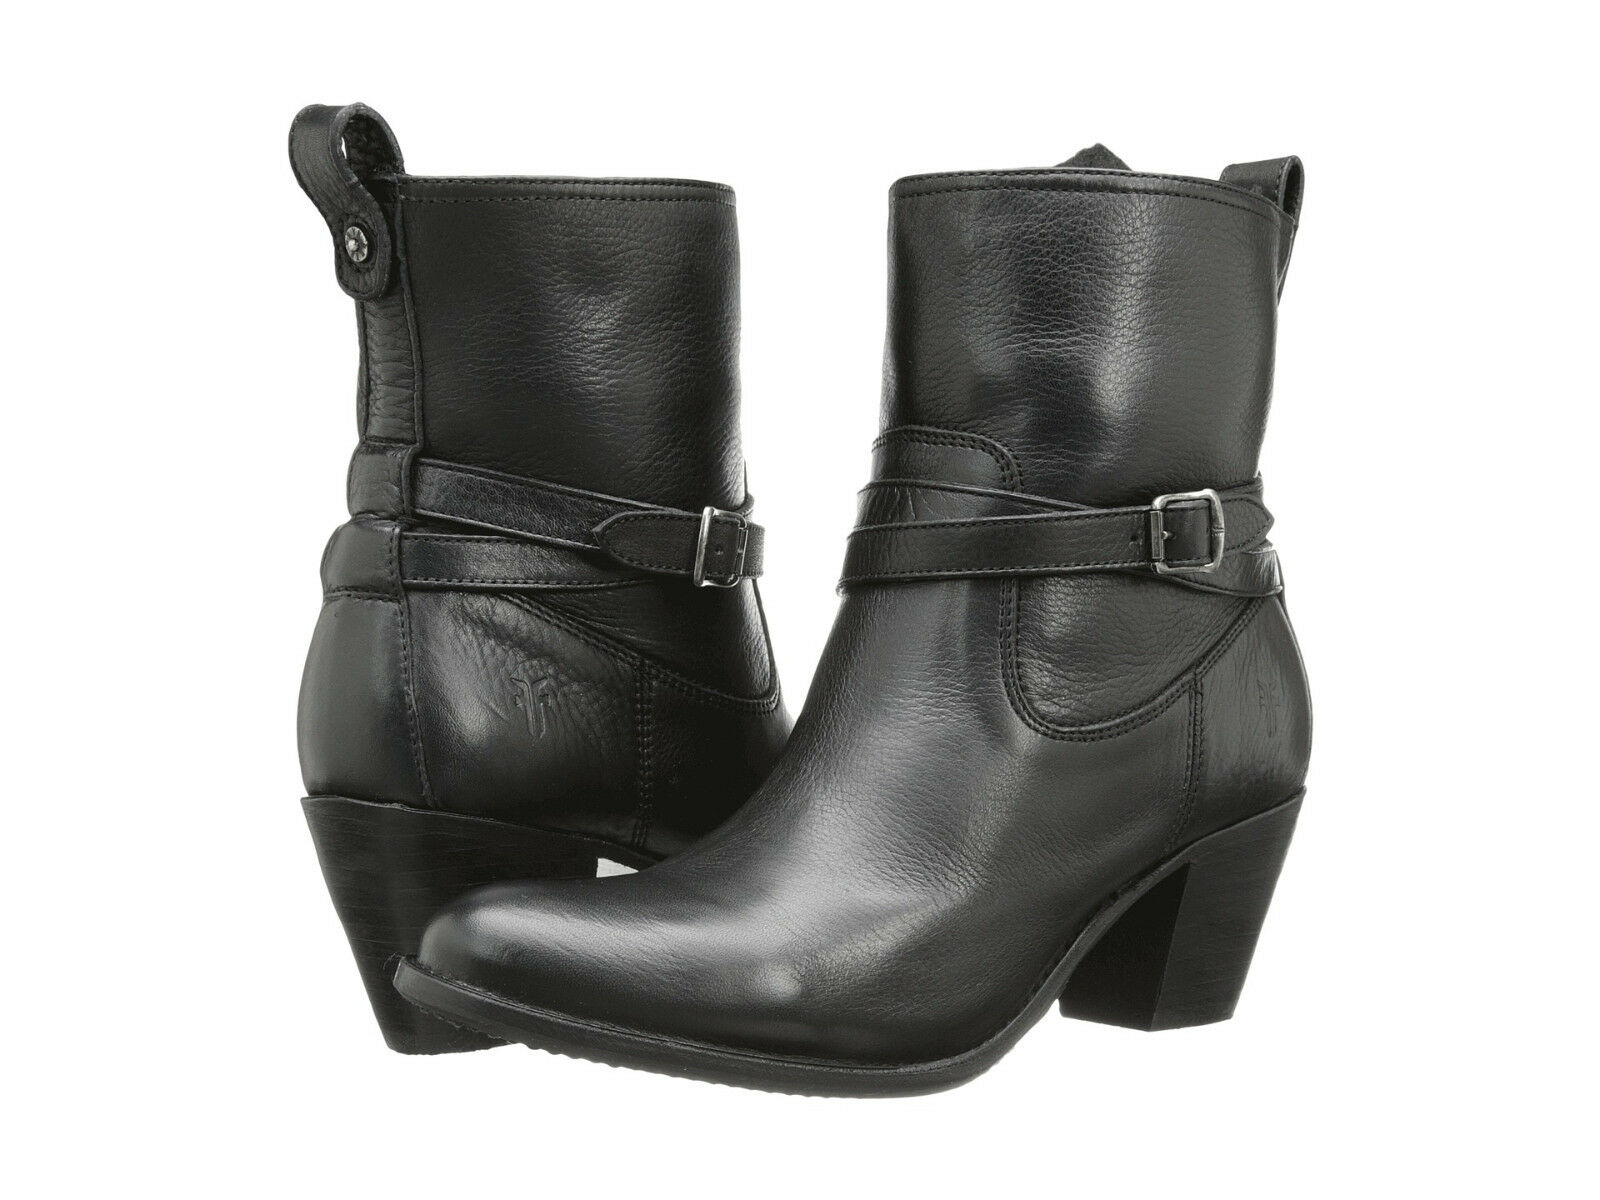 Women's Frye Boots Jackie Rivet Short ZipOn Black Leather 76291 BLK